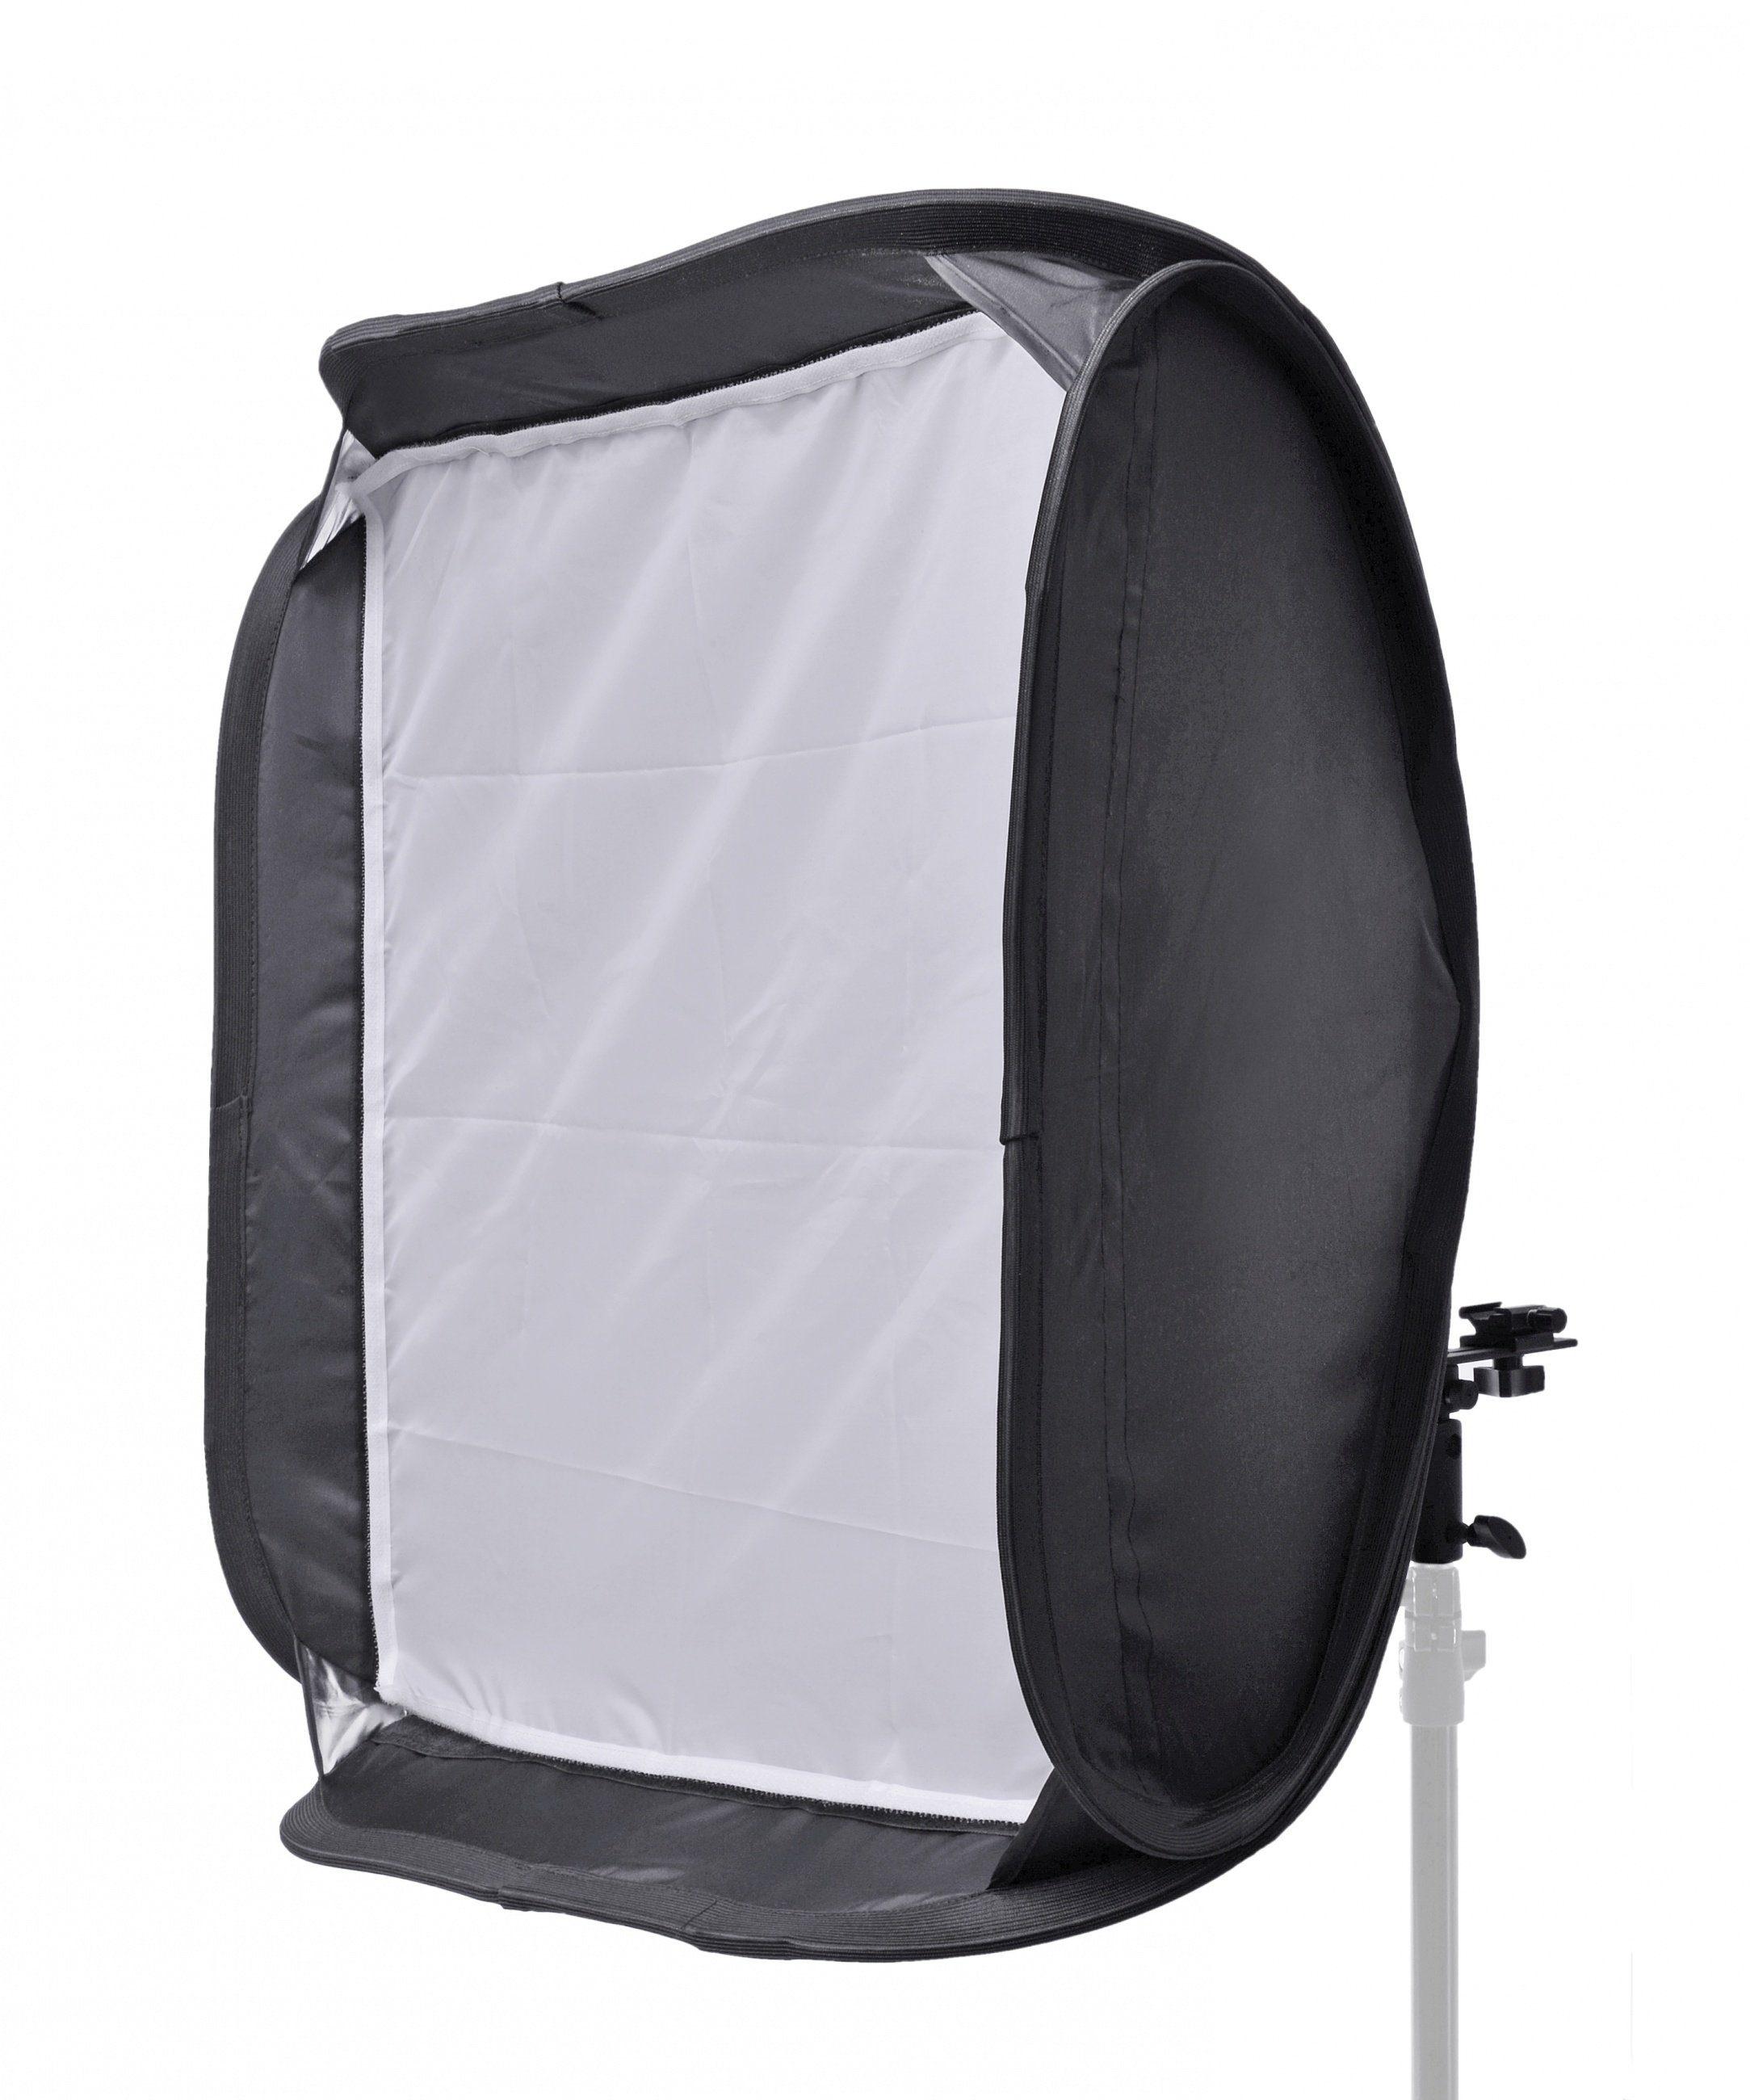 Bresser Fotostudio »SS-14 Kamerablitz-Softbox 60x60cm«